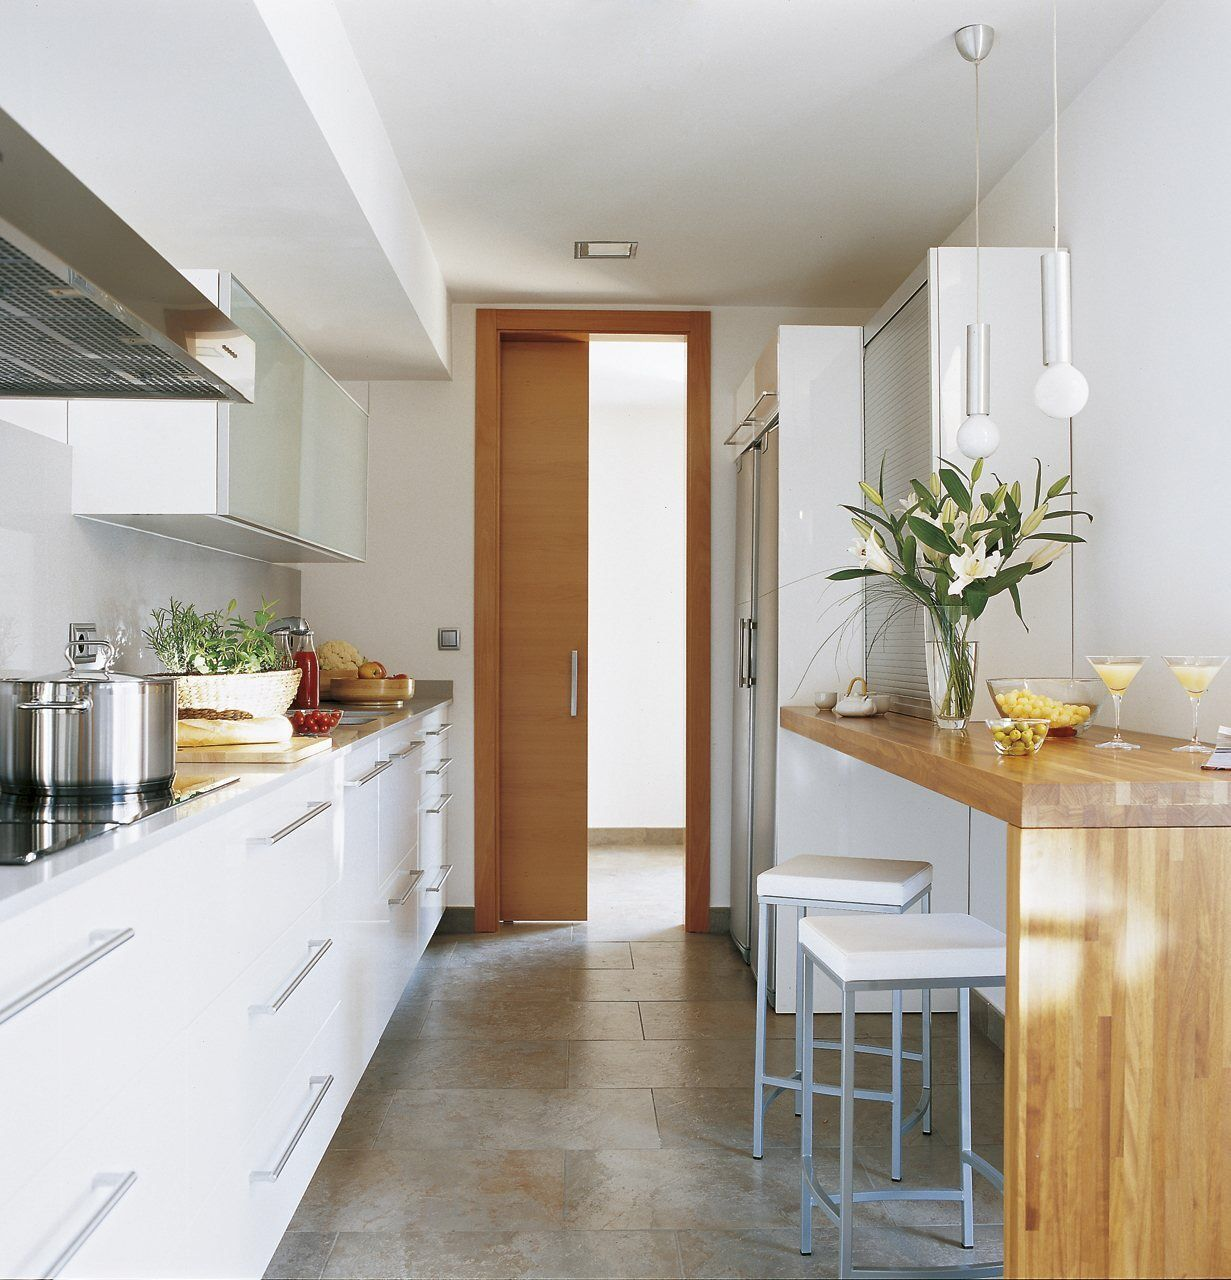 12 reasonably priced slim rectangular kitchen design ideas midcenturymodernkitchendesign on kitchen remodel ideas id=93949